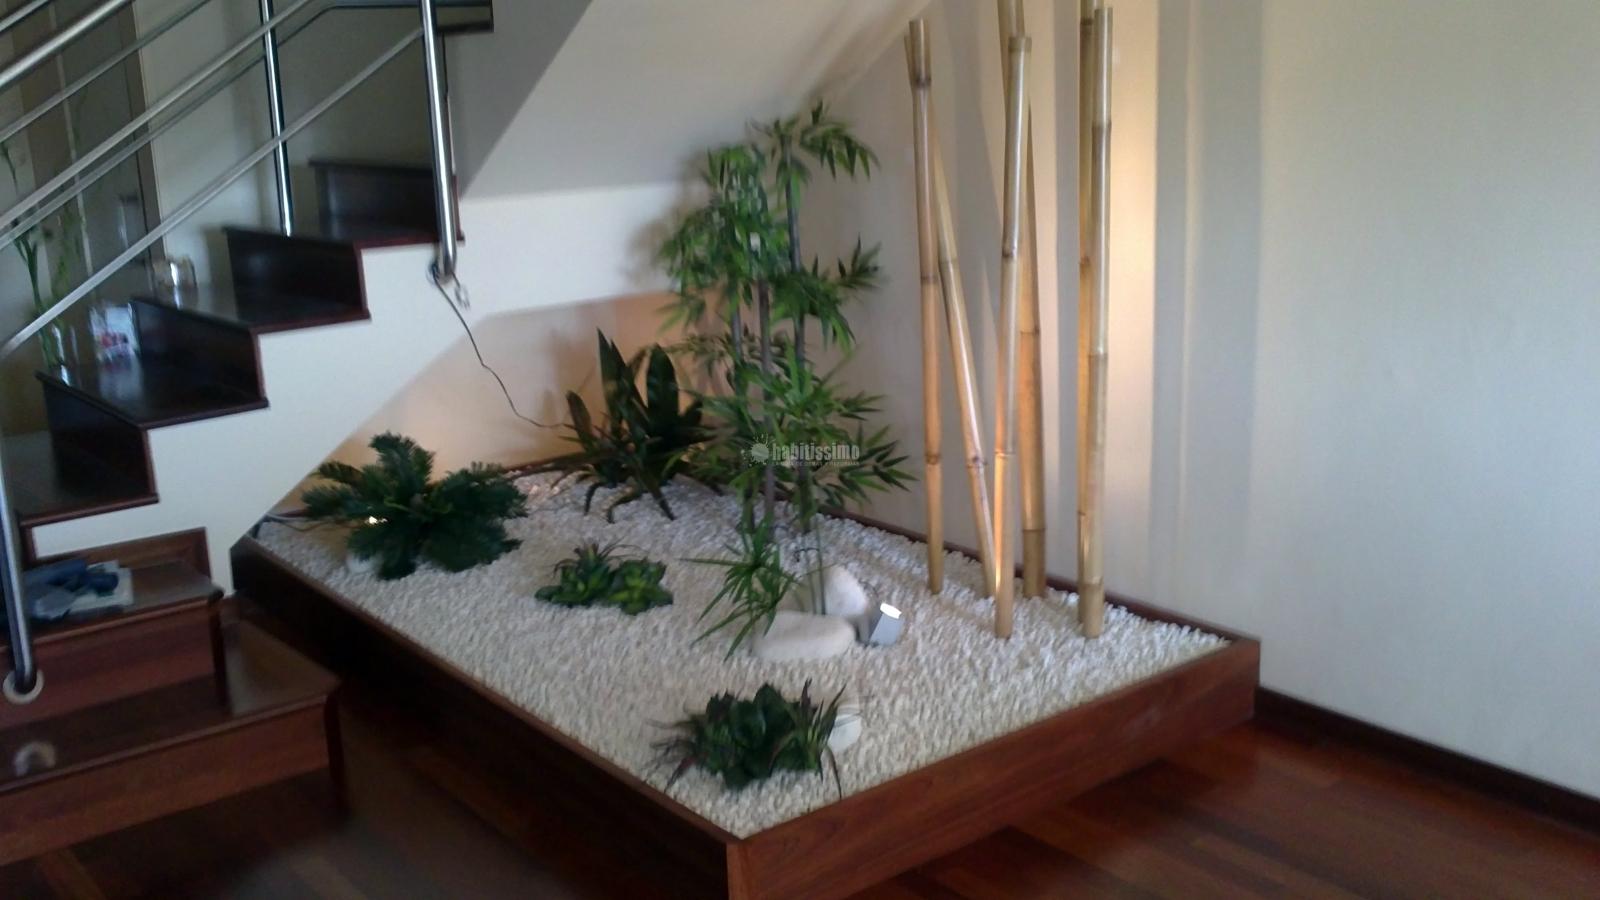 Jardinera Interior Ideas Carpinteros - Jardinera-interior